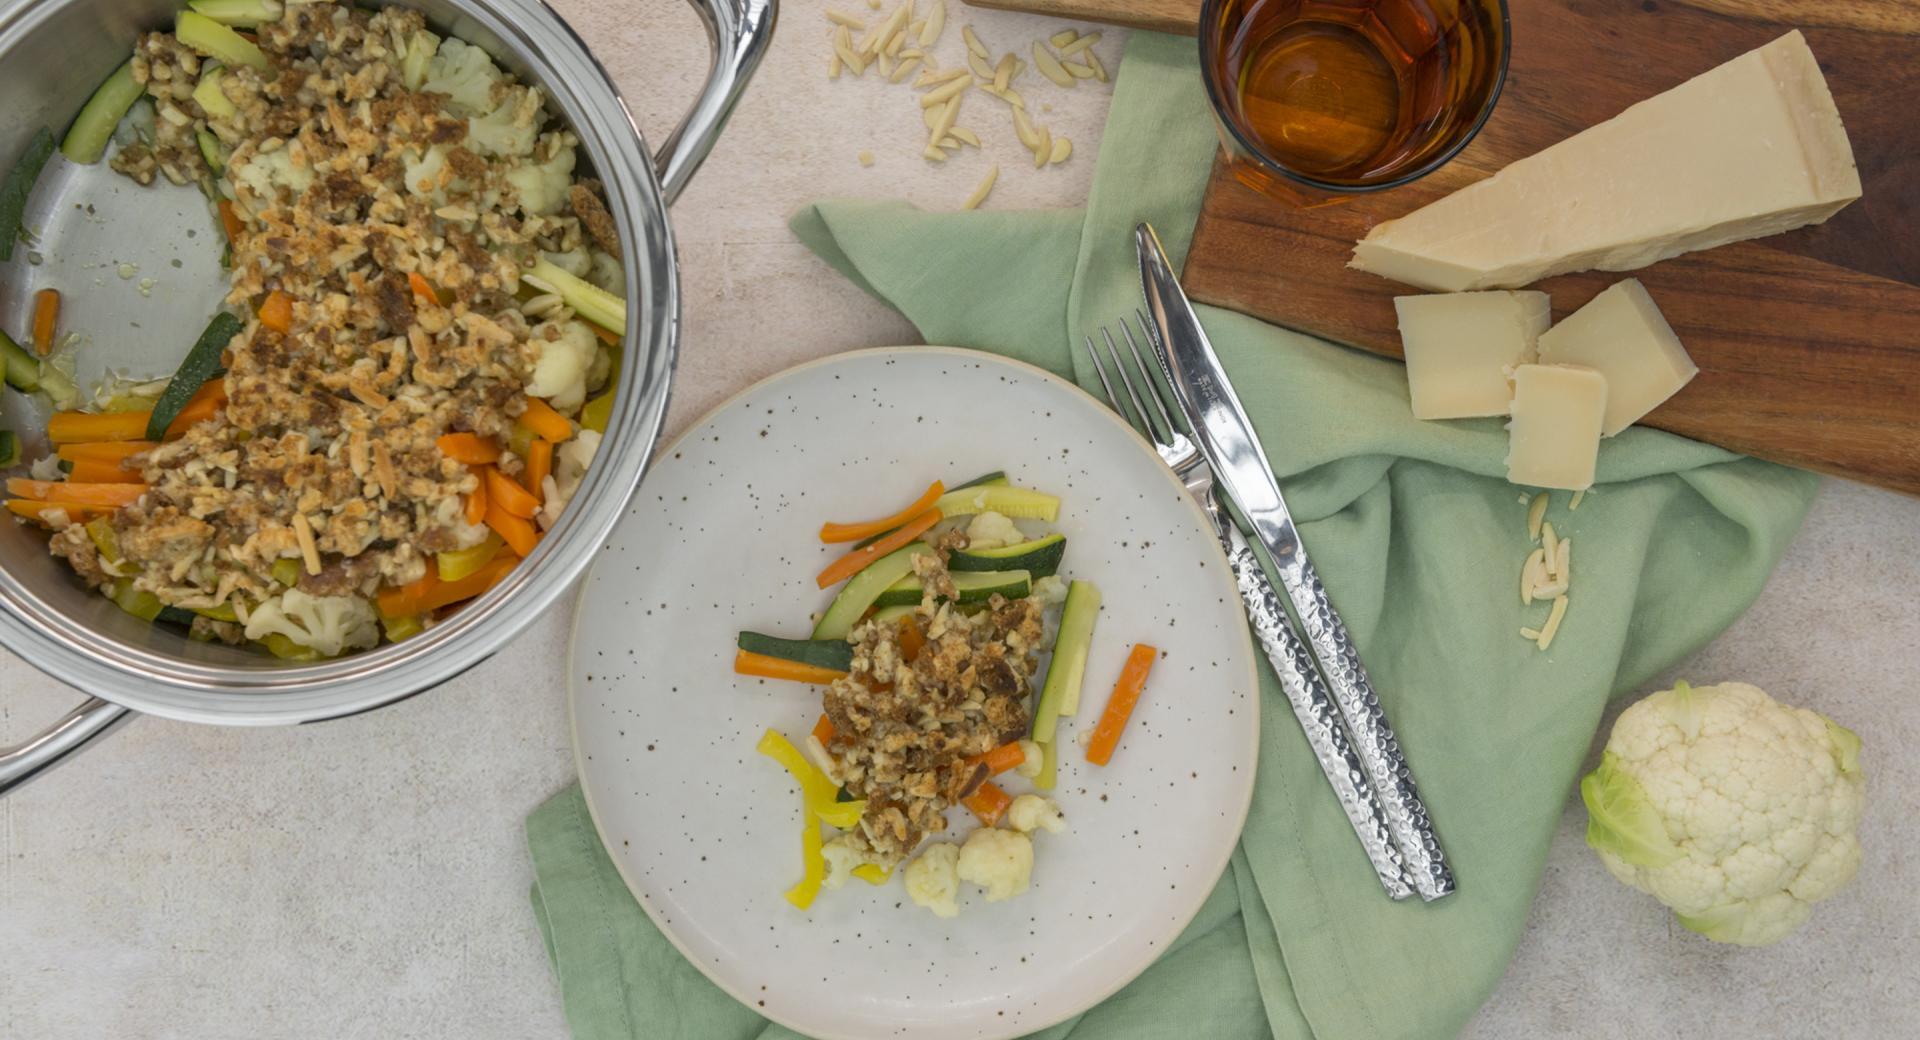 Garden vegetables with crispy cheese crust